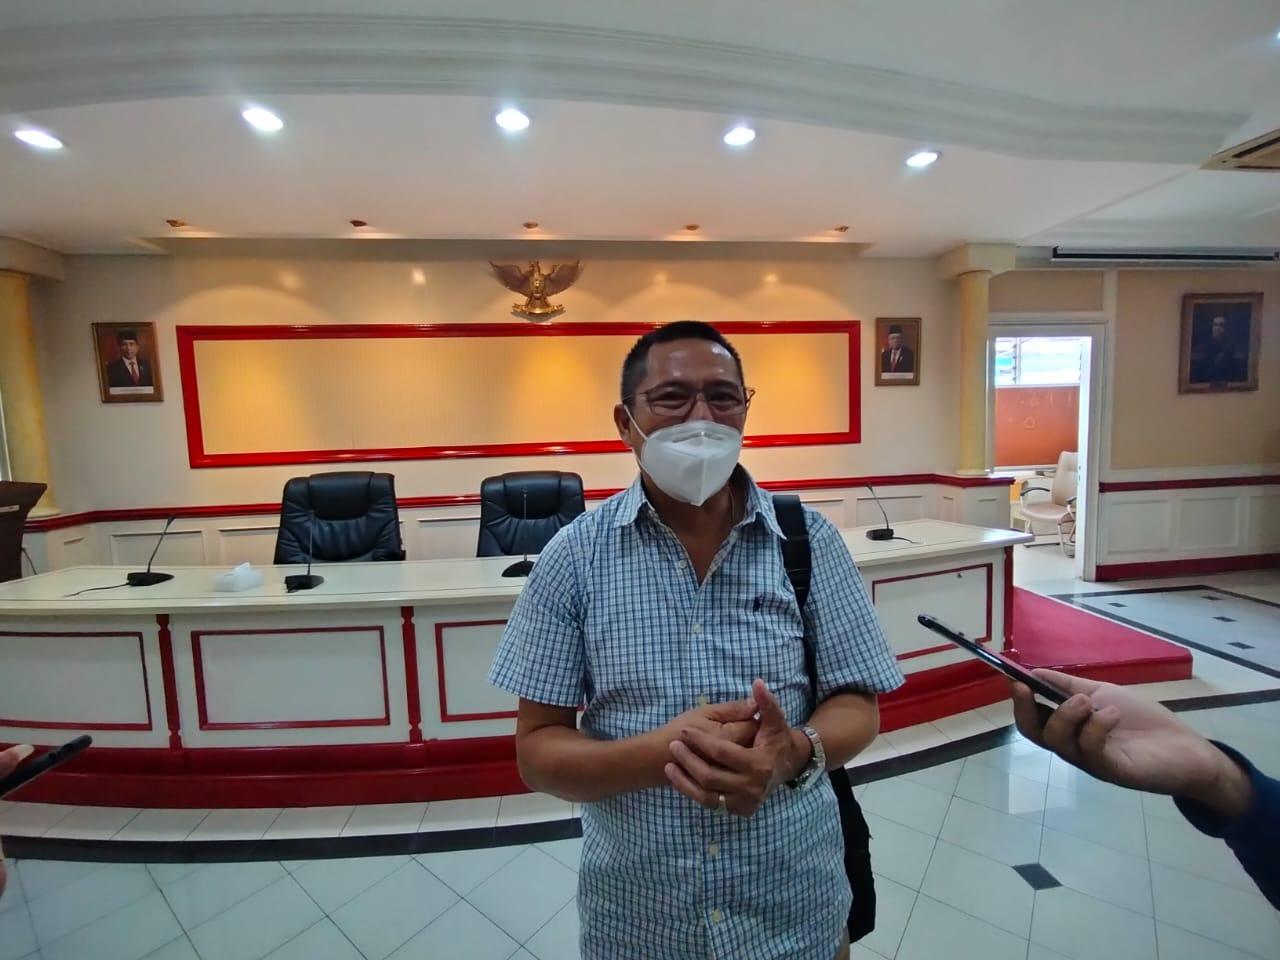 Ketua DPD APTRI PG Kebon Agung Dwi Irianto berbicara soal gula kristal. (Foto: Rap/Tugu Jatim)